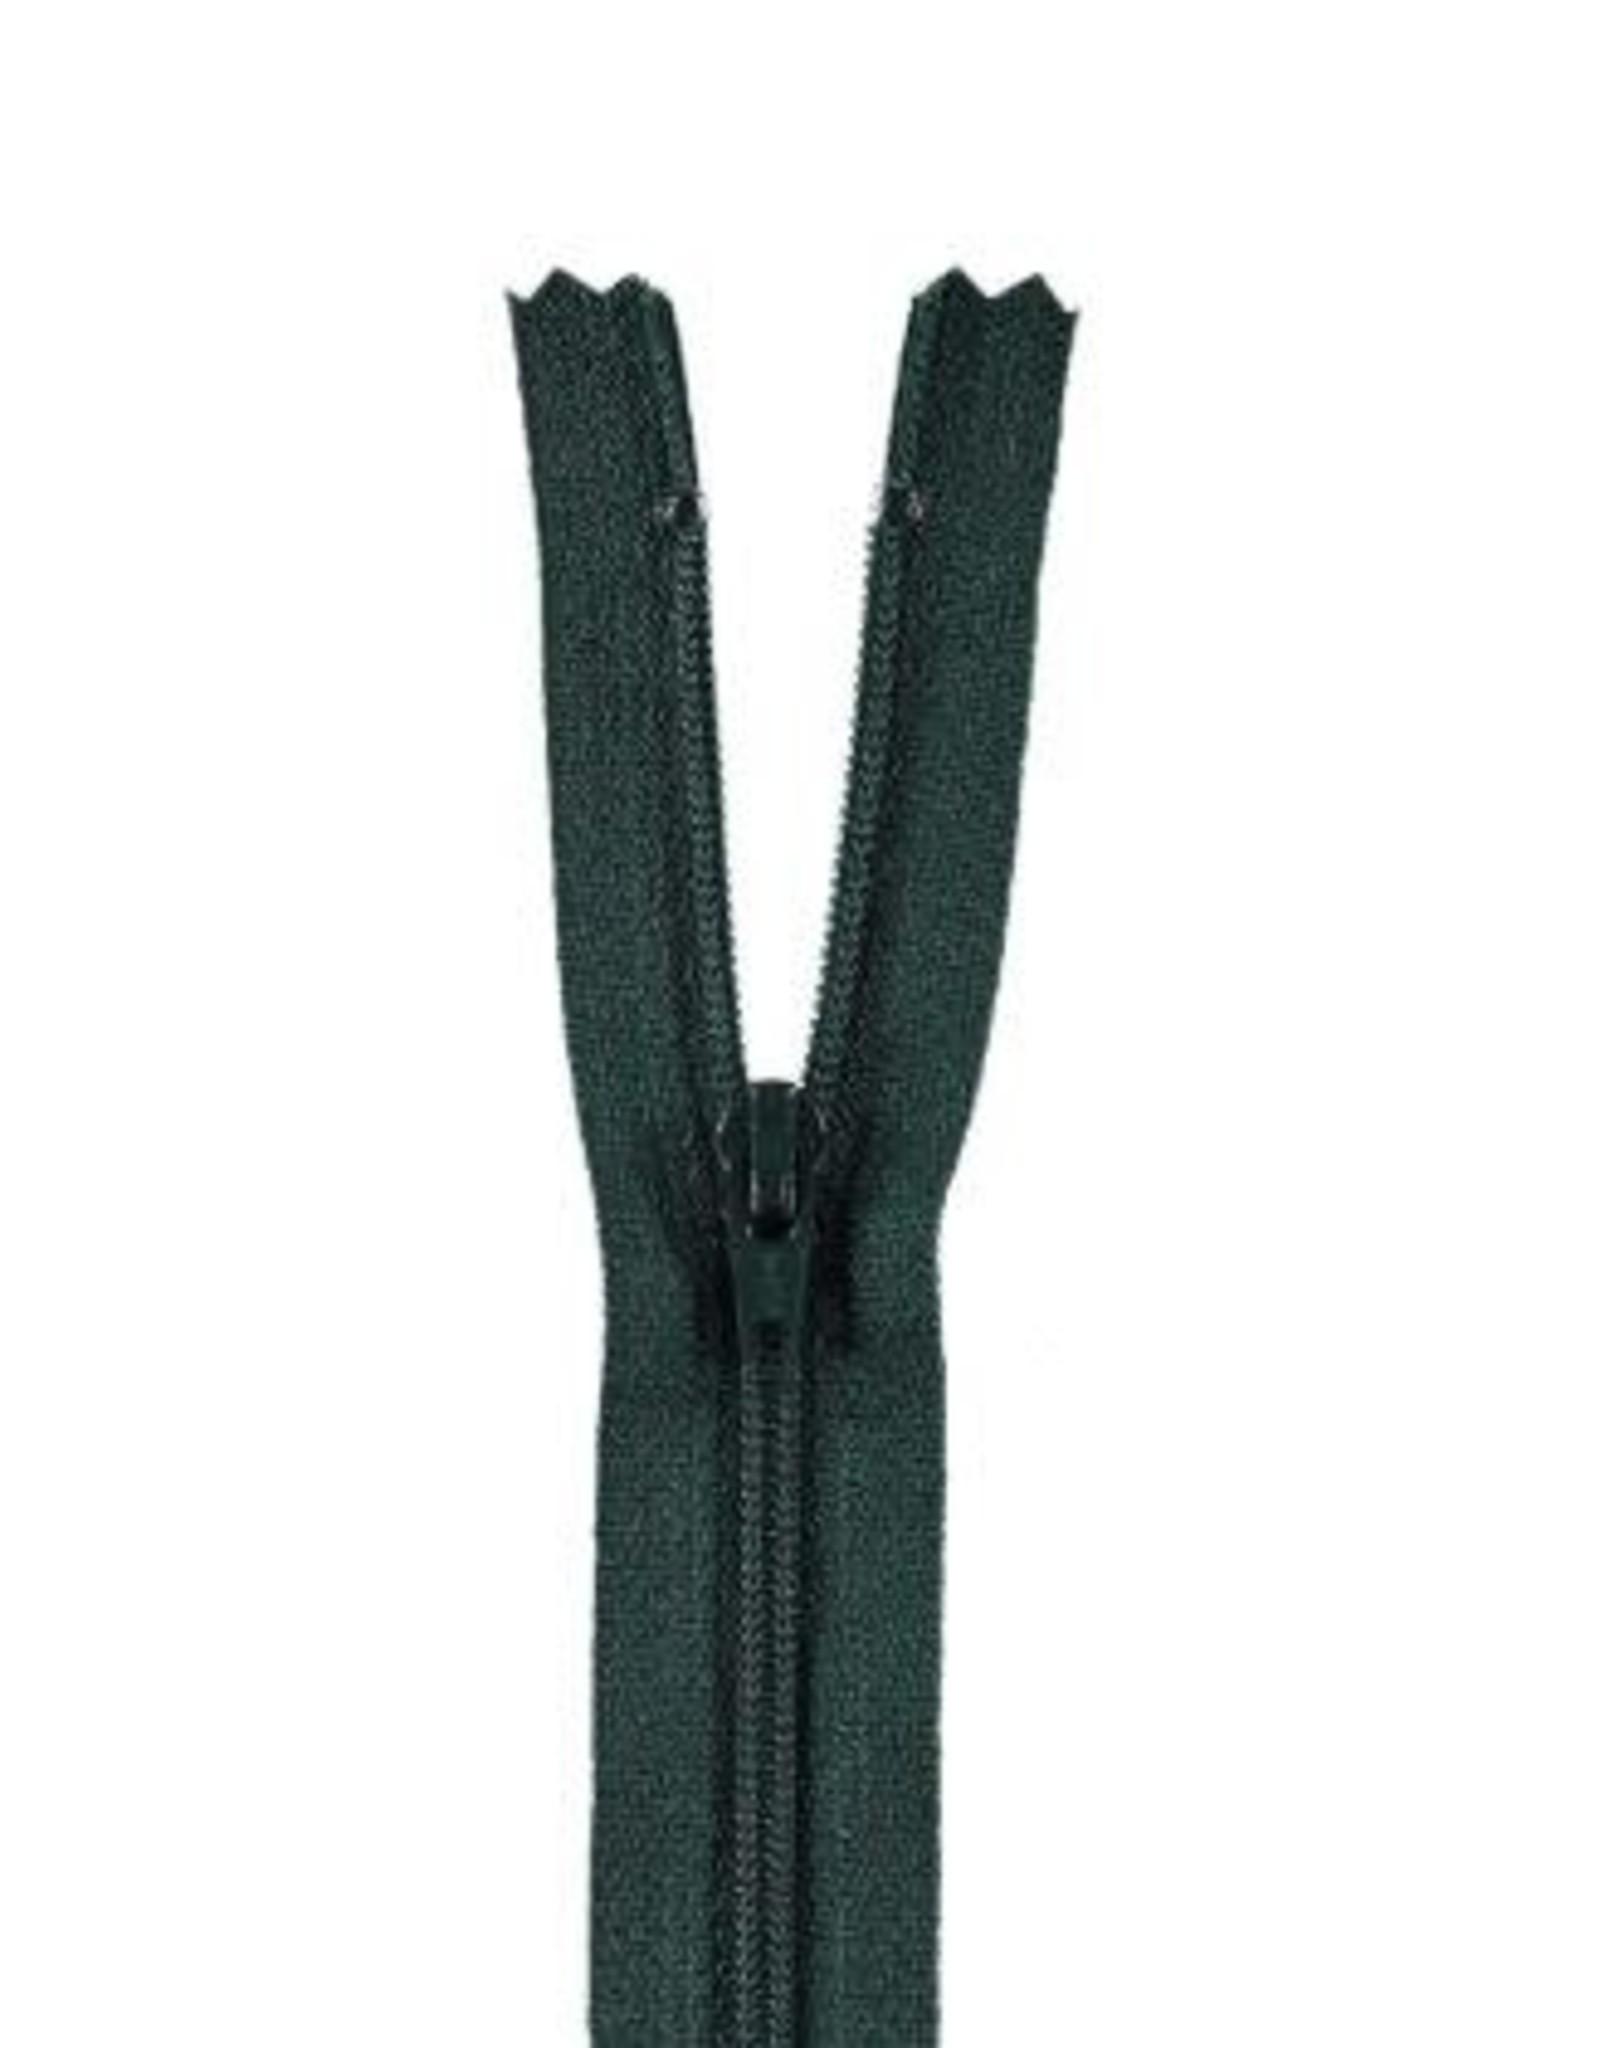 YKK Spiraalrits niet-DB 3mm donker groen 890-12cm